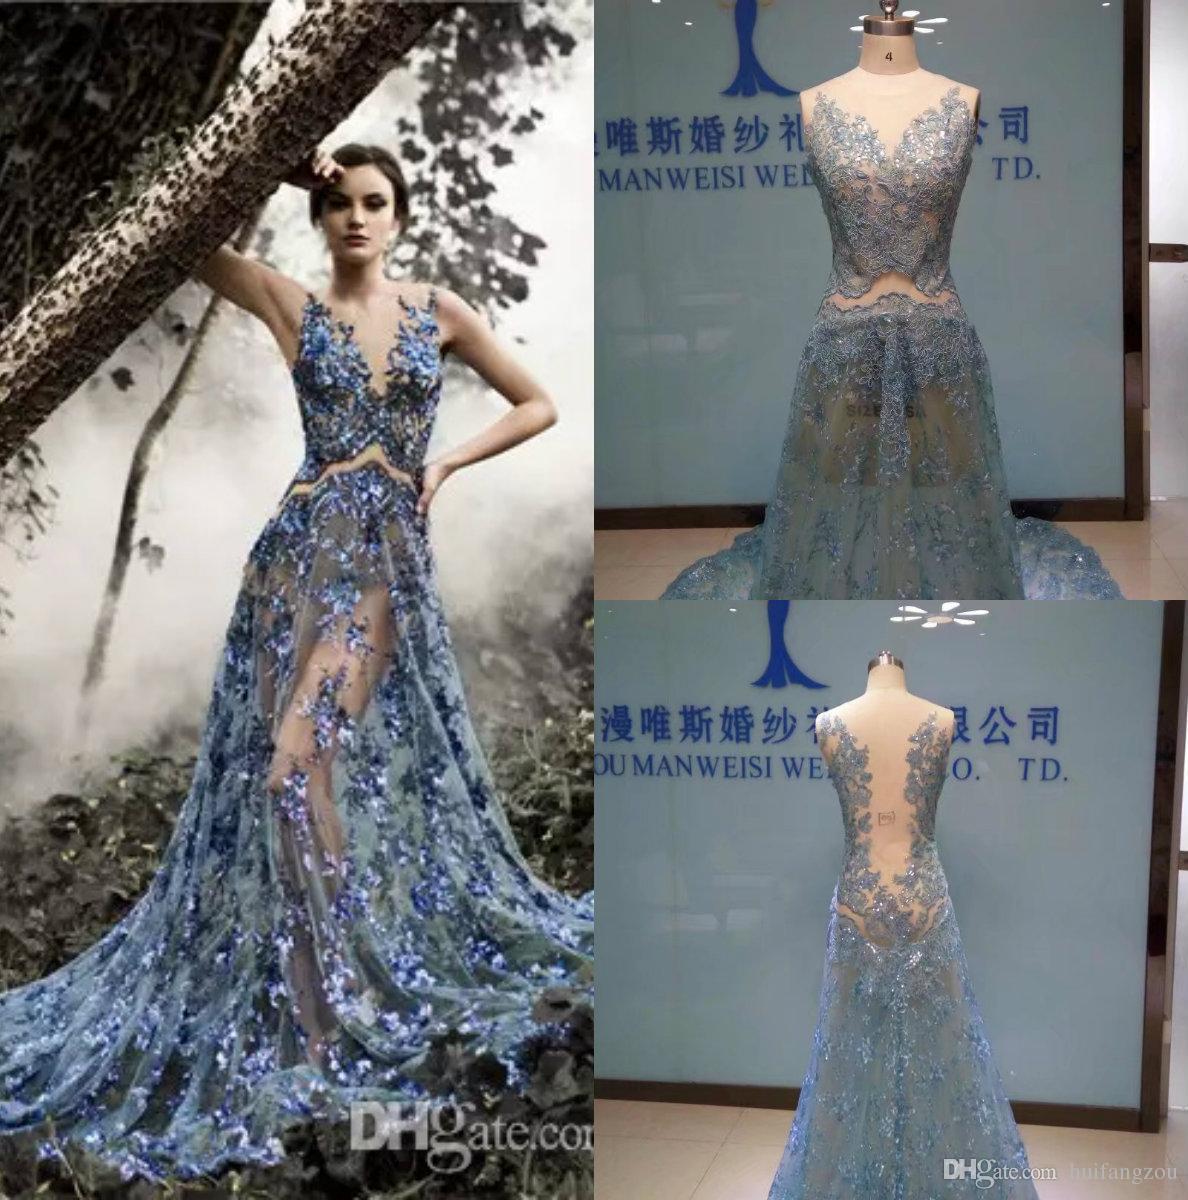 78d187aec026 Großhandel Sexy Paolo Sebastian Abendkleider Blau Appliques Pailletten Real  Bilder Sheer Tulle Sweep Zug Celebrity Dress Prom Kleider Von Huifangzou,  ...